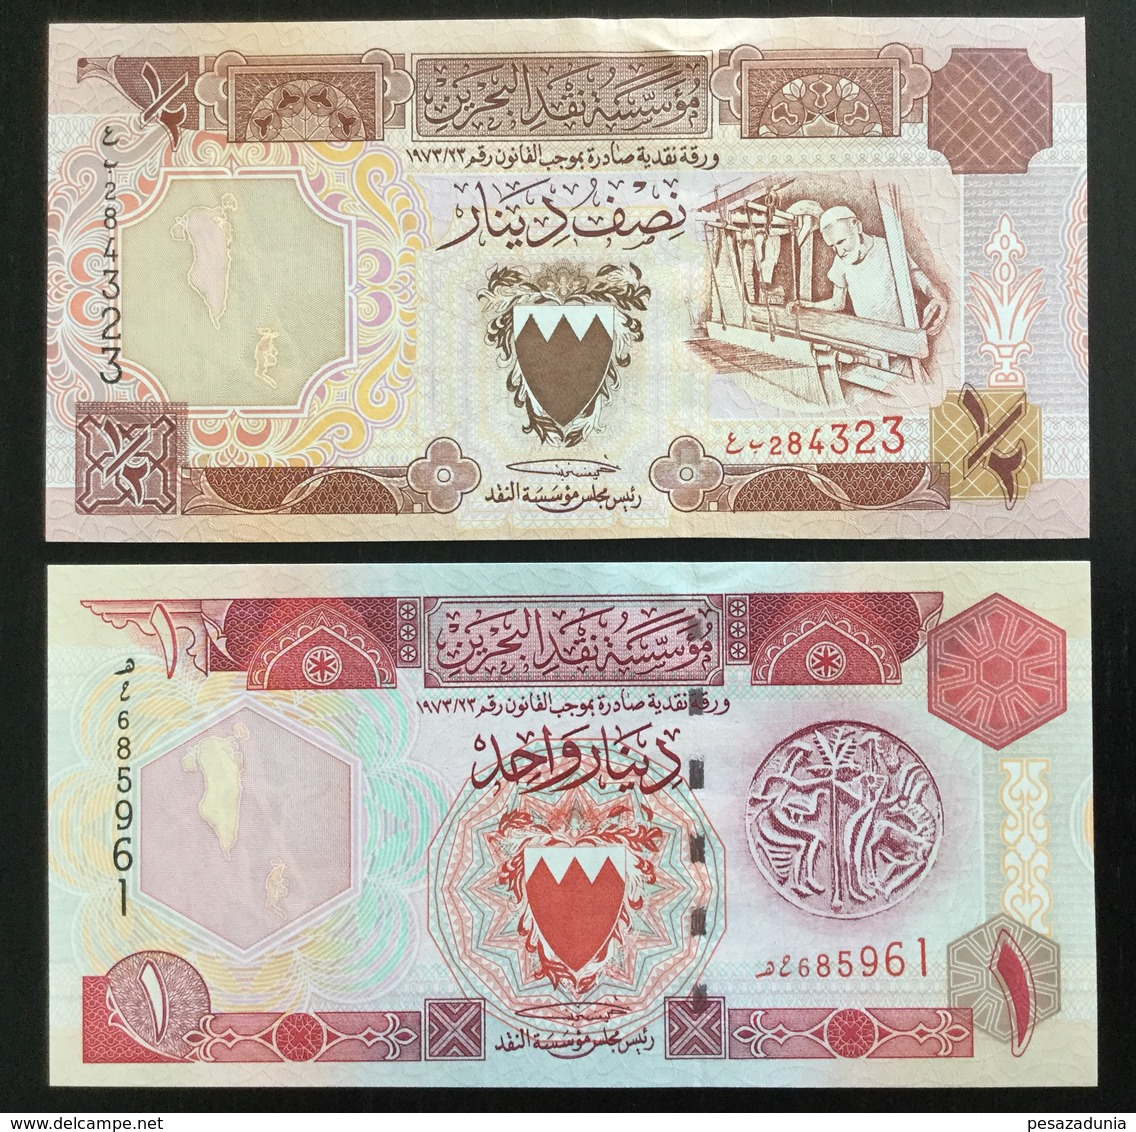 BAHRAIN SET 1/2, 1 DINAR BANKNOTES (1998) UNC - Bahrein